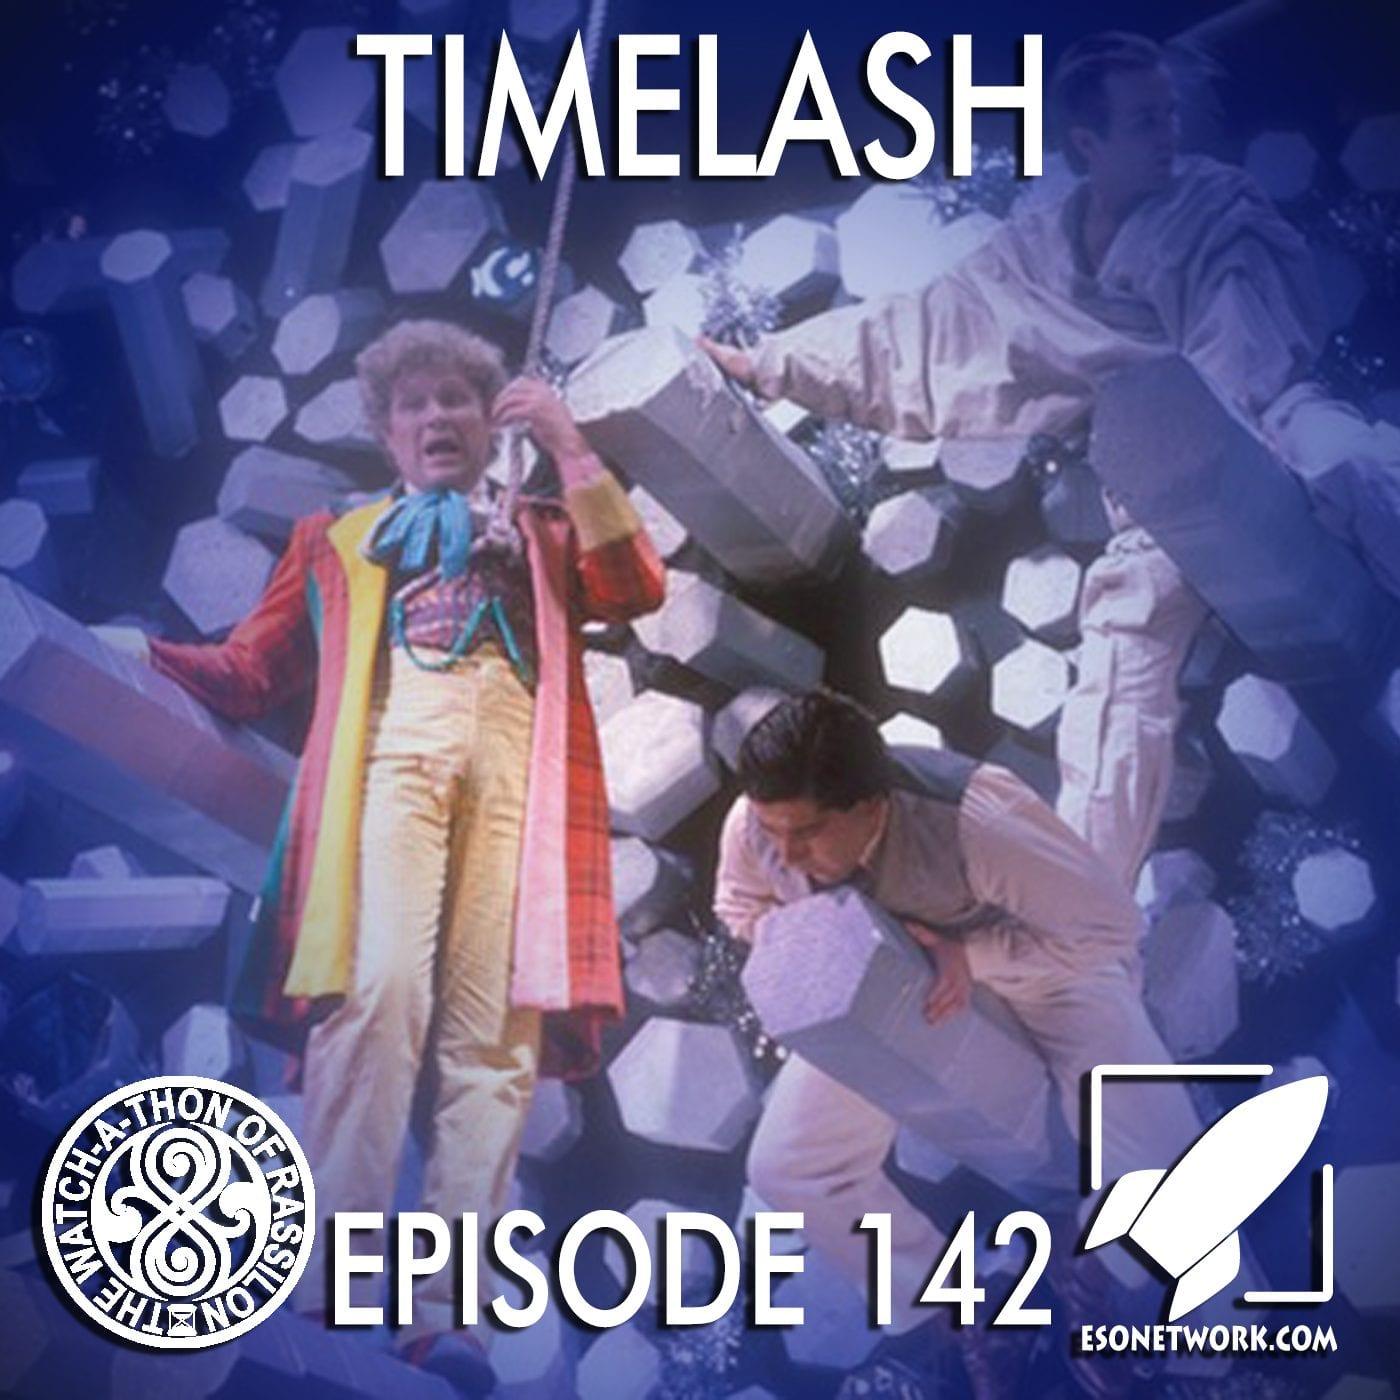 The Watch-A-Thon of Rassilon: Episode 142: Timelash